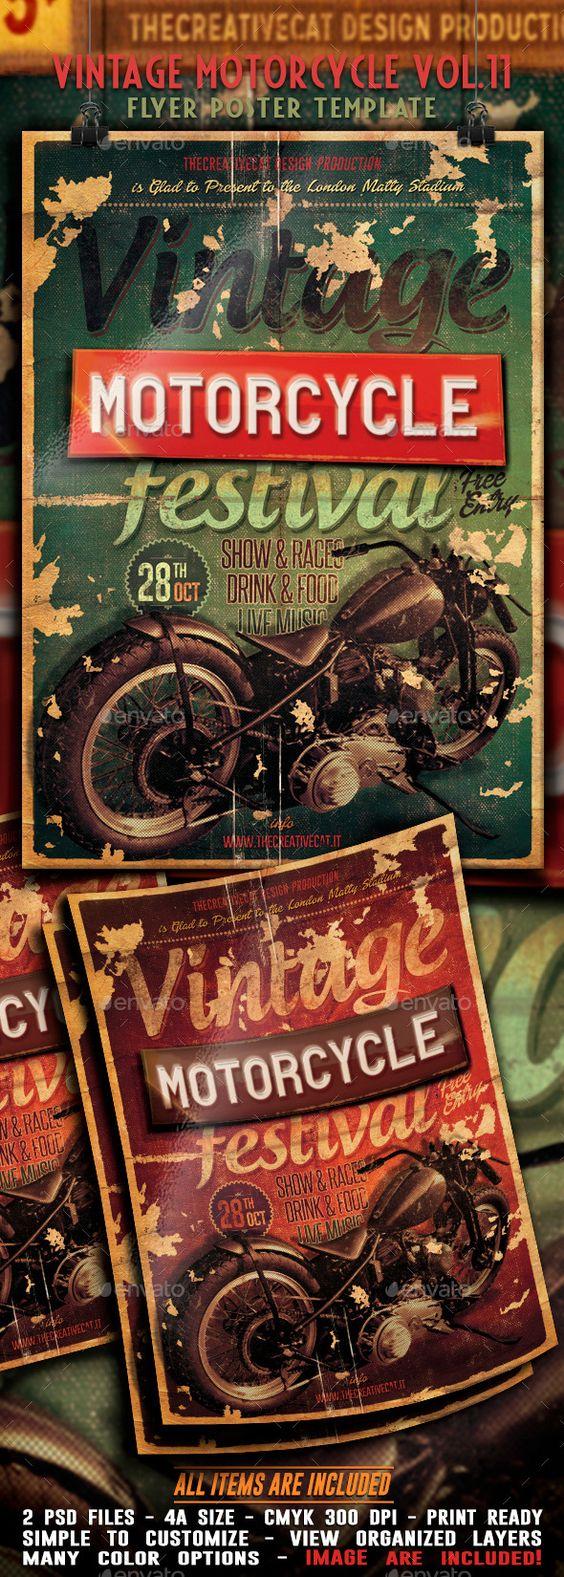 vintage motorcycle flyer poster template psd buy and download. Black Bedroom Furniture Sets. Home Design Ideas